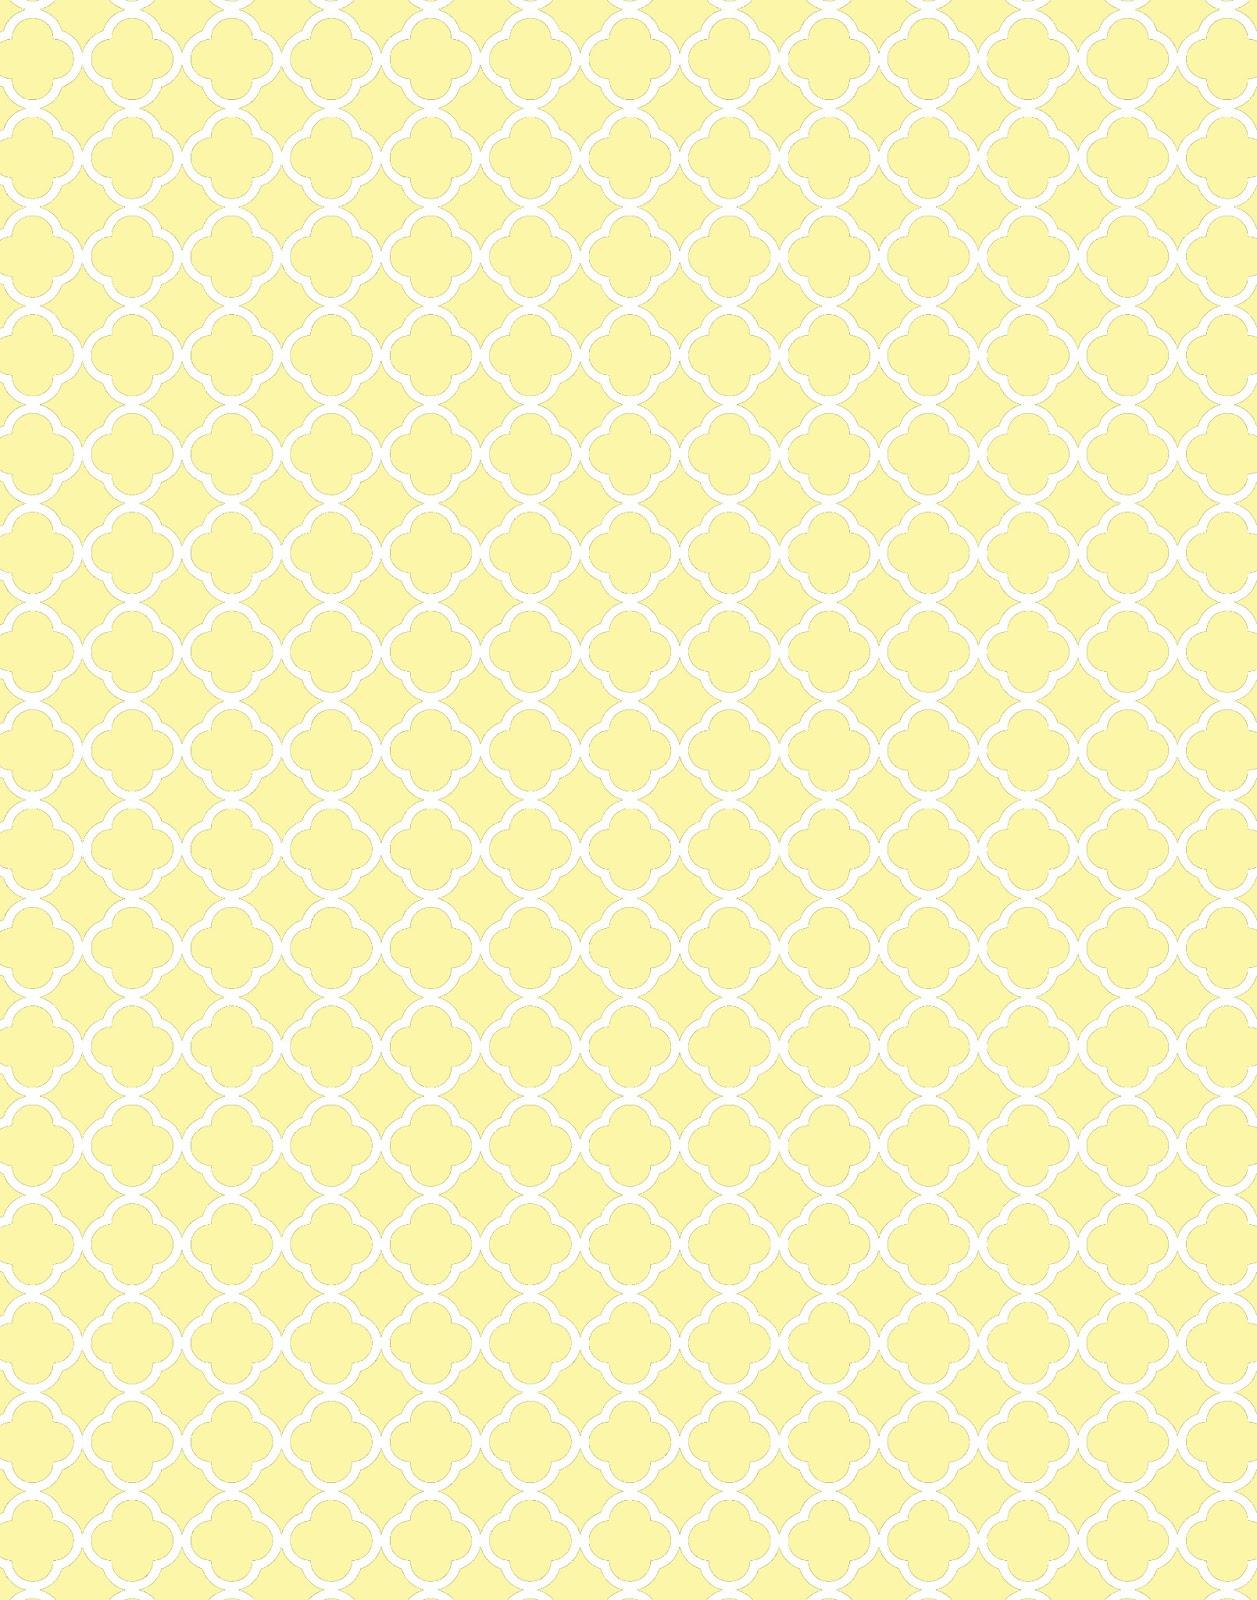 quatrefoil pattern background - photo #13